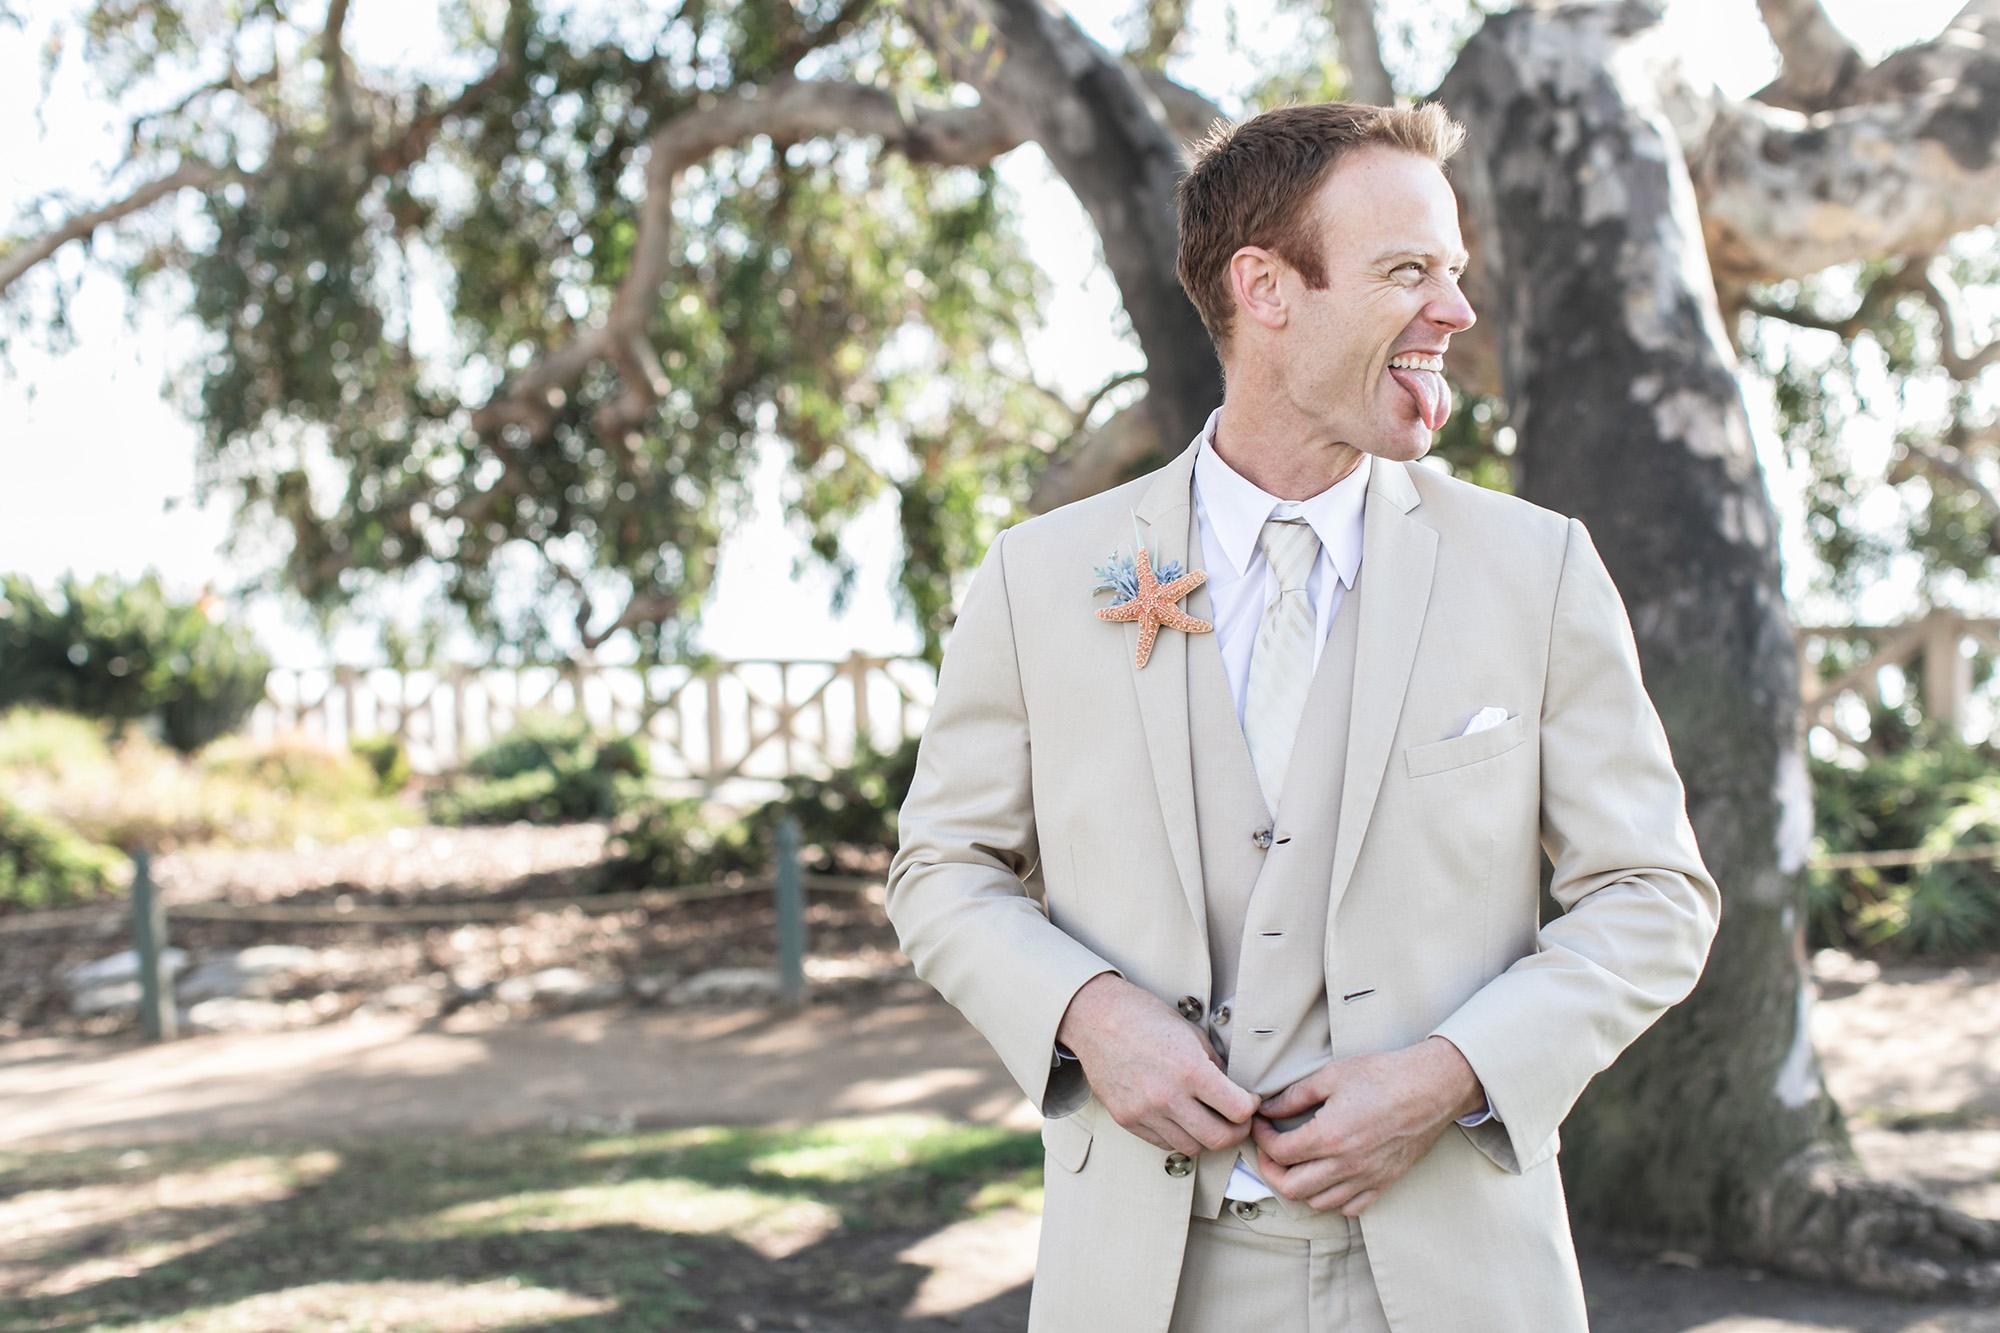 unforgettable-st-monica-wedding-carrie-vines-photography-041.jpg